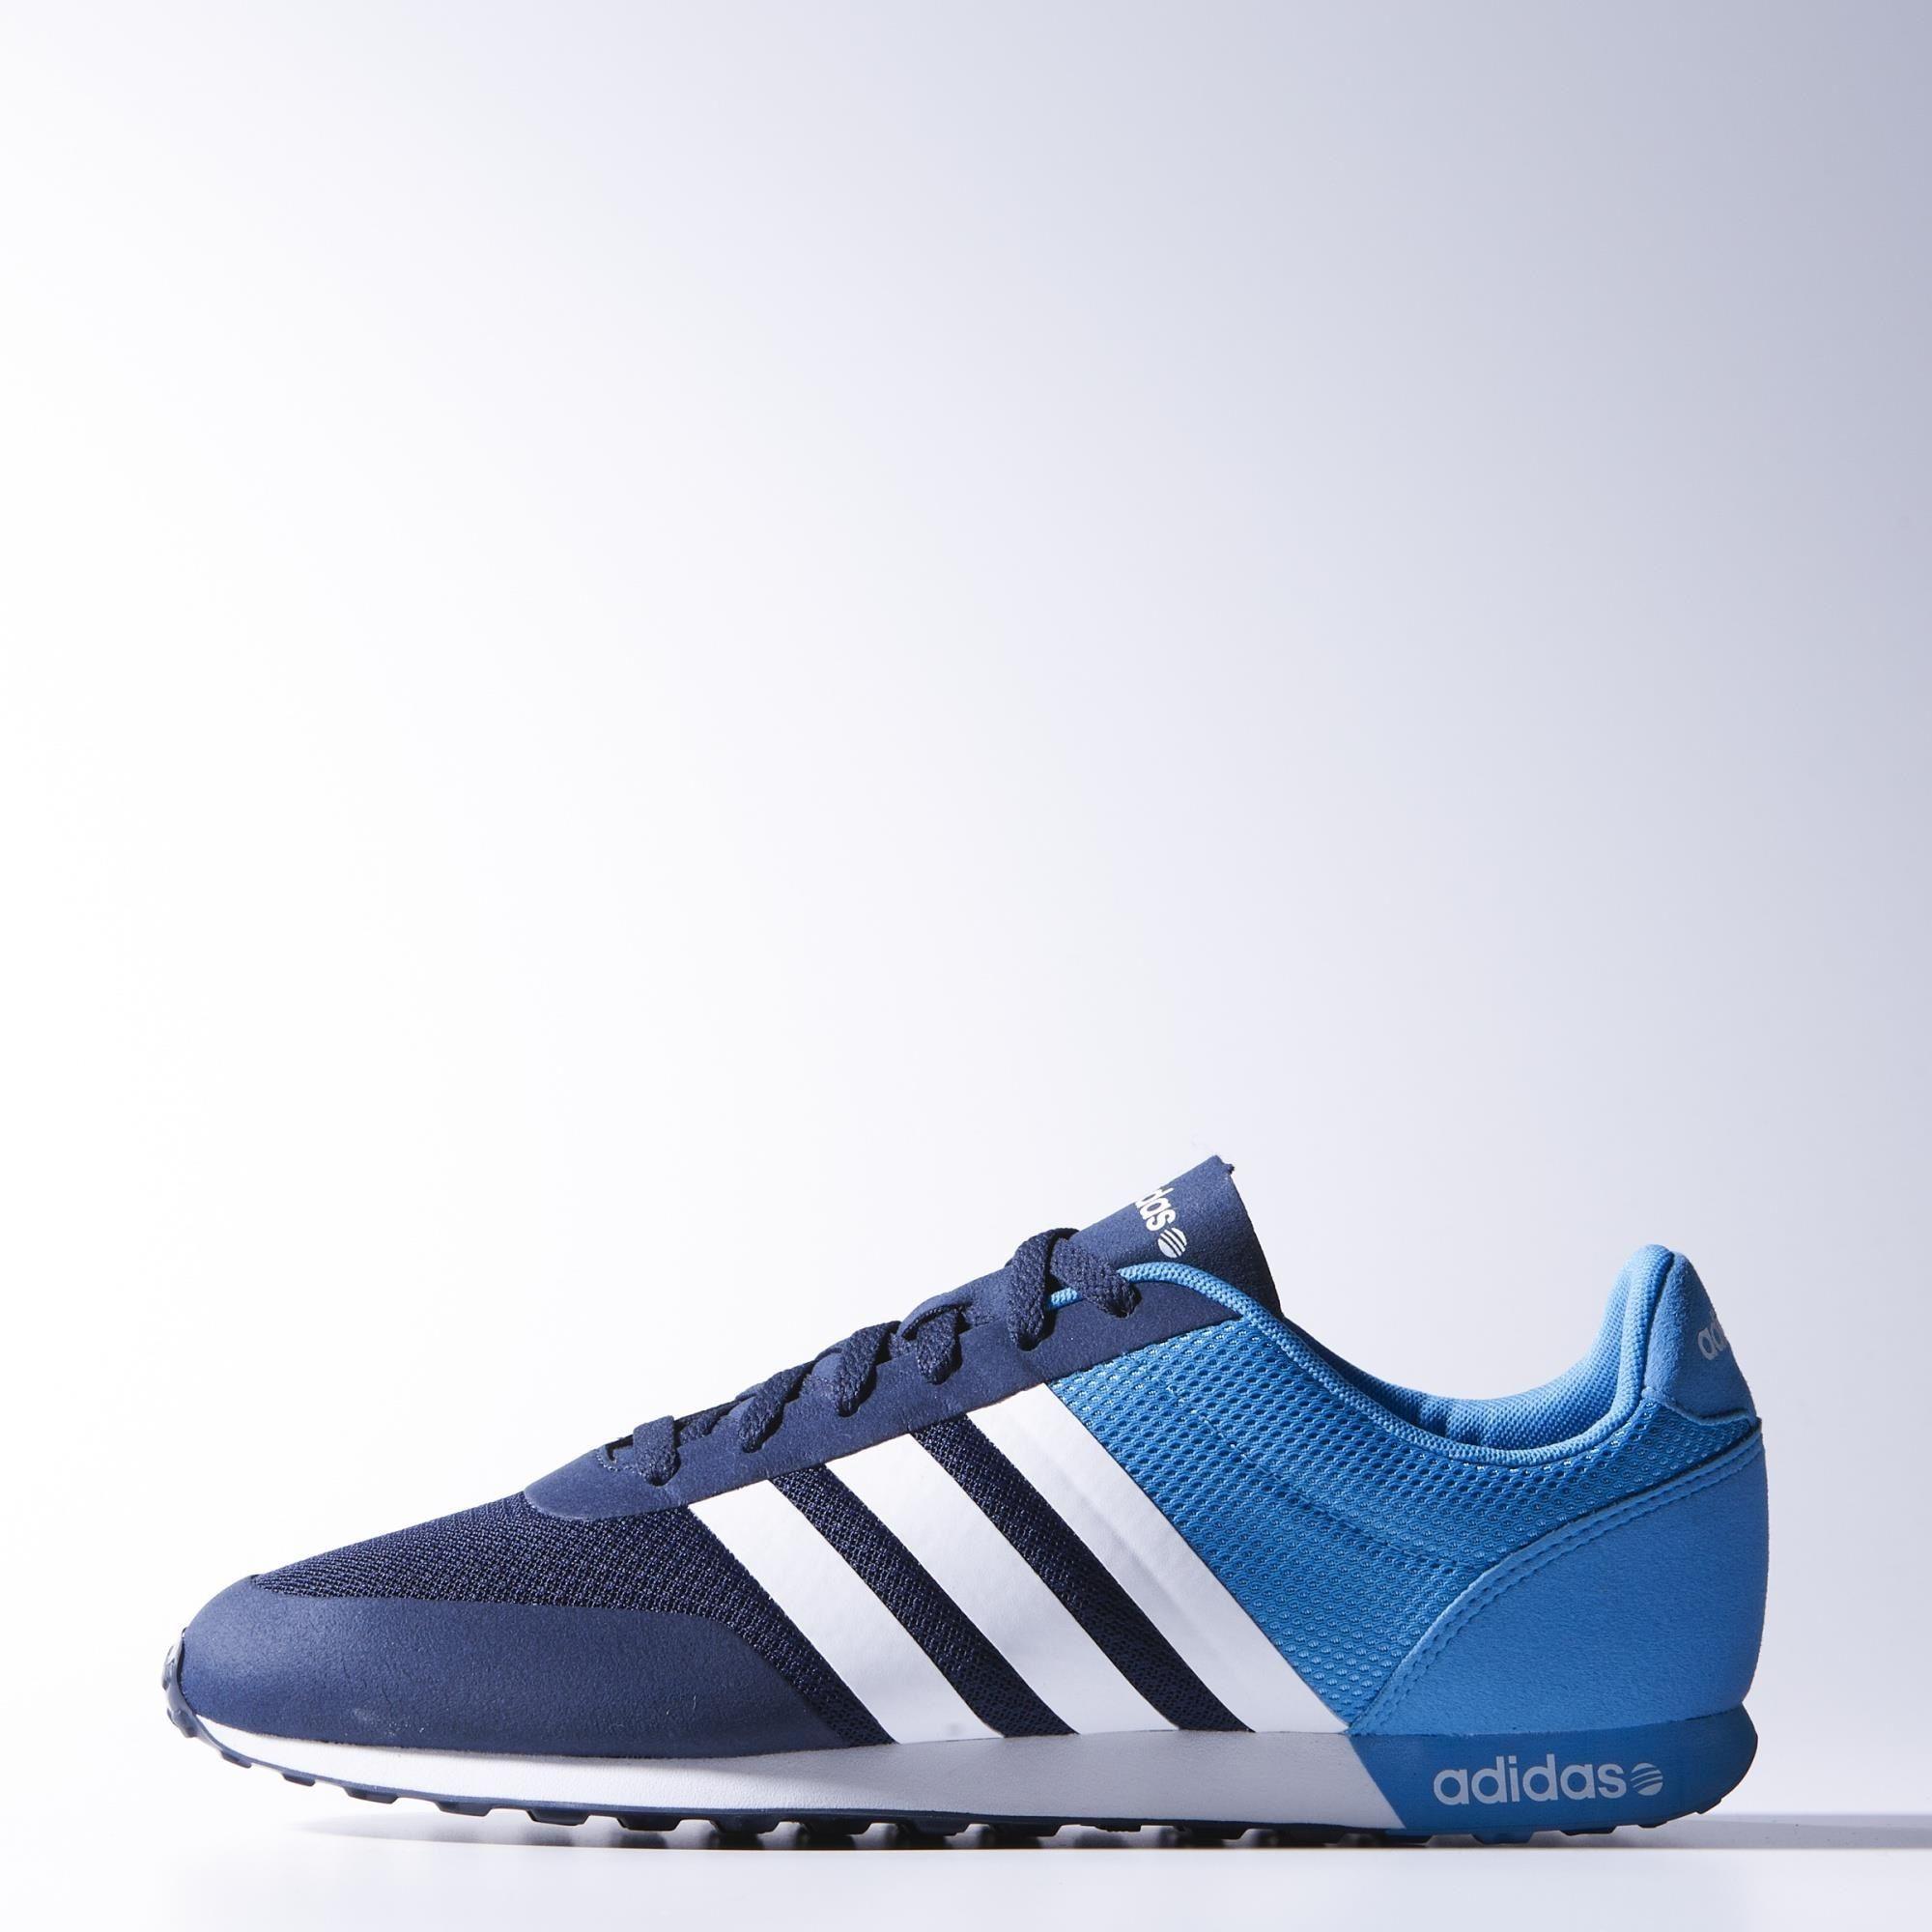 calzado hombre adidas sneakers